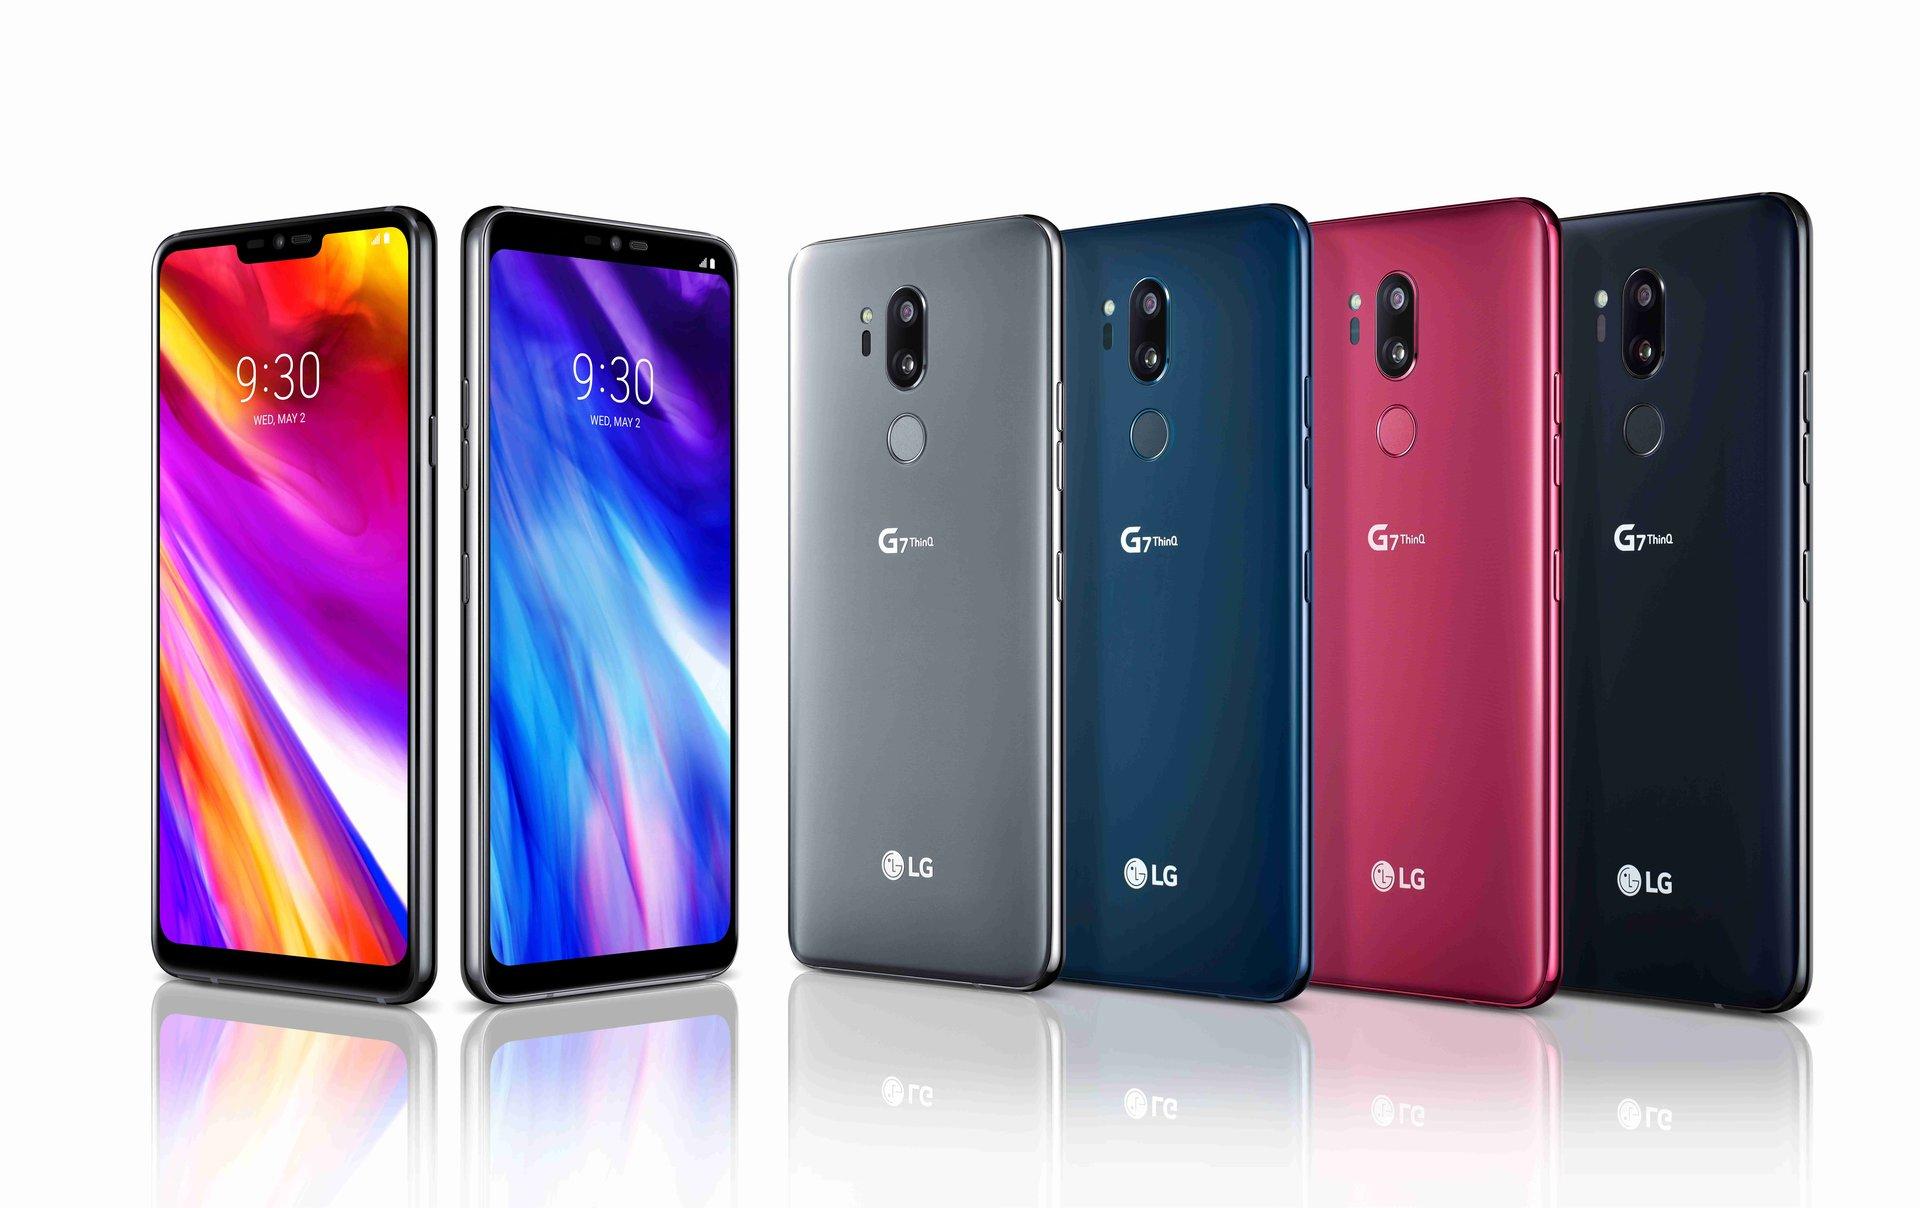 LG-G7-ThinQ-Range1.jpg